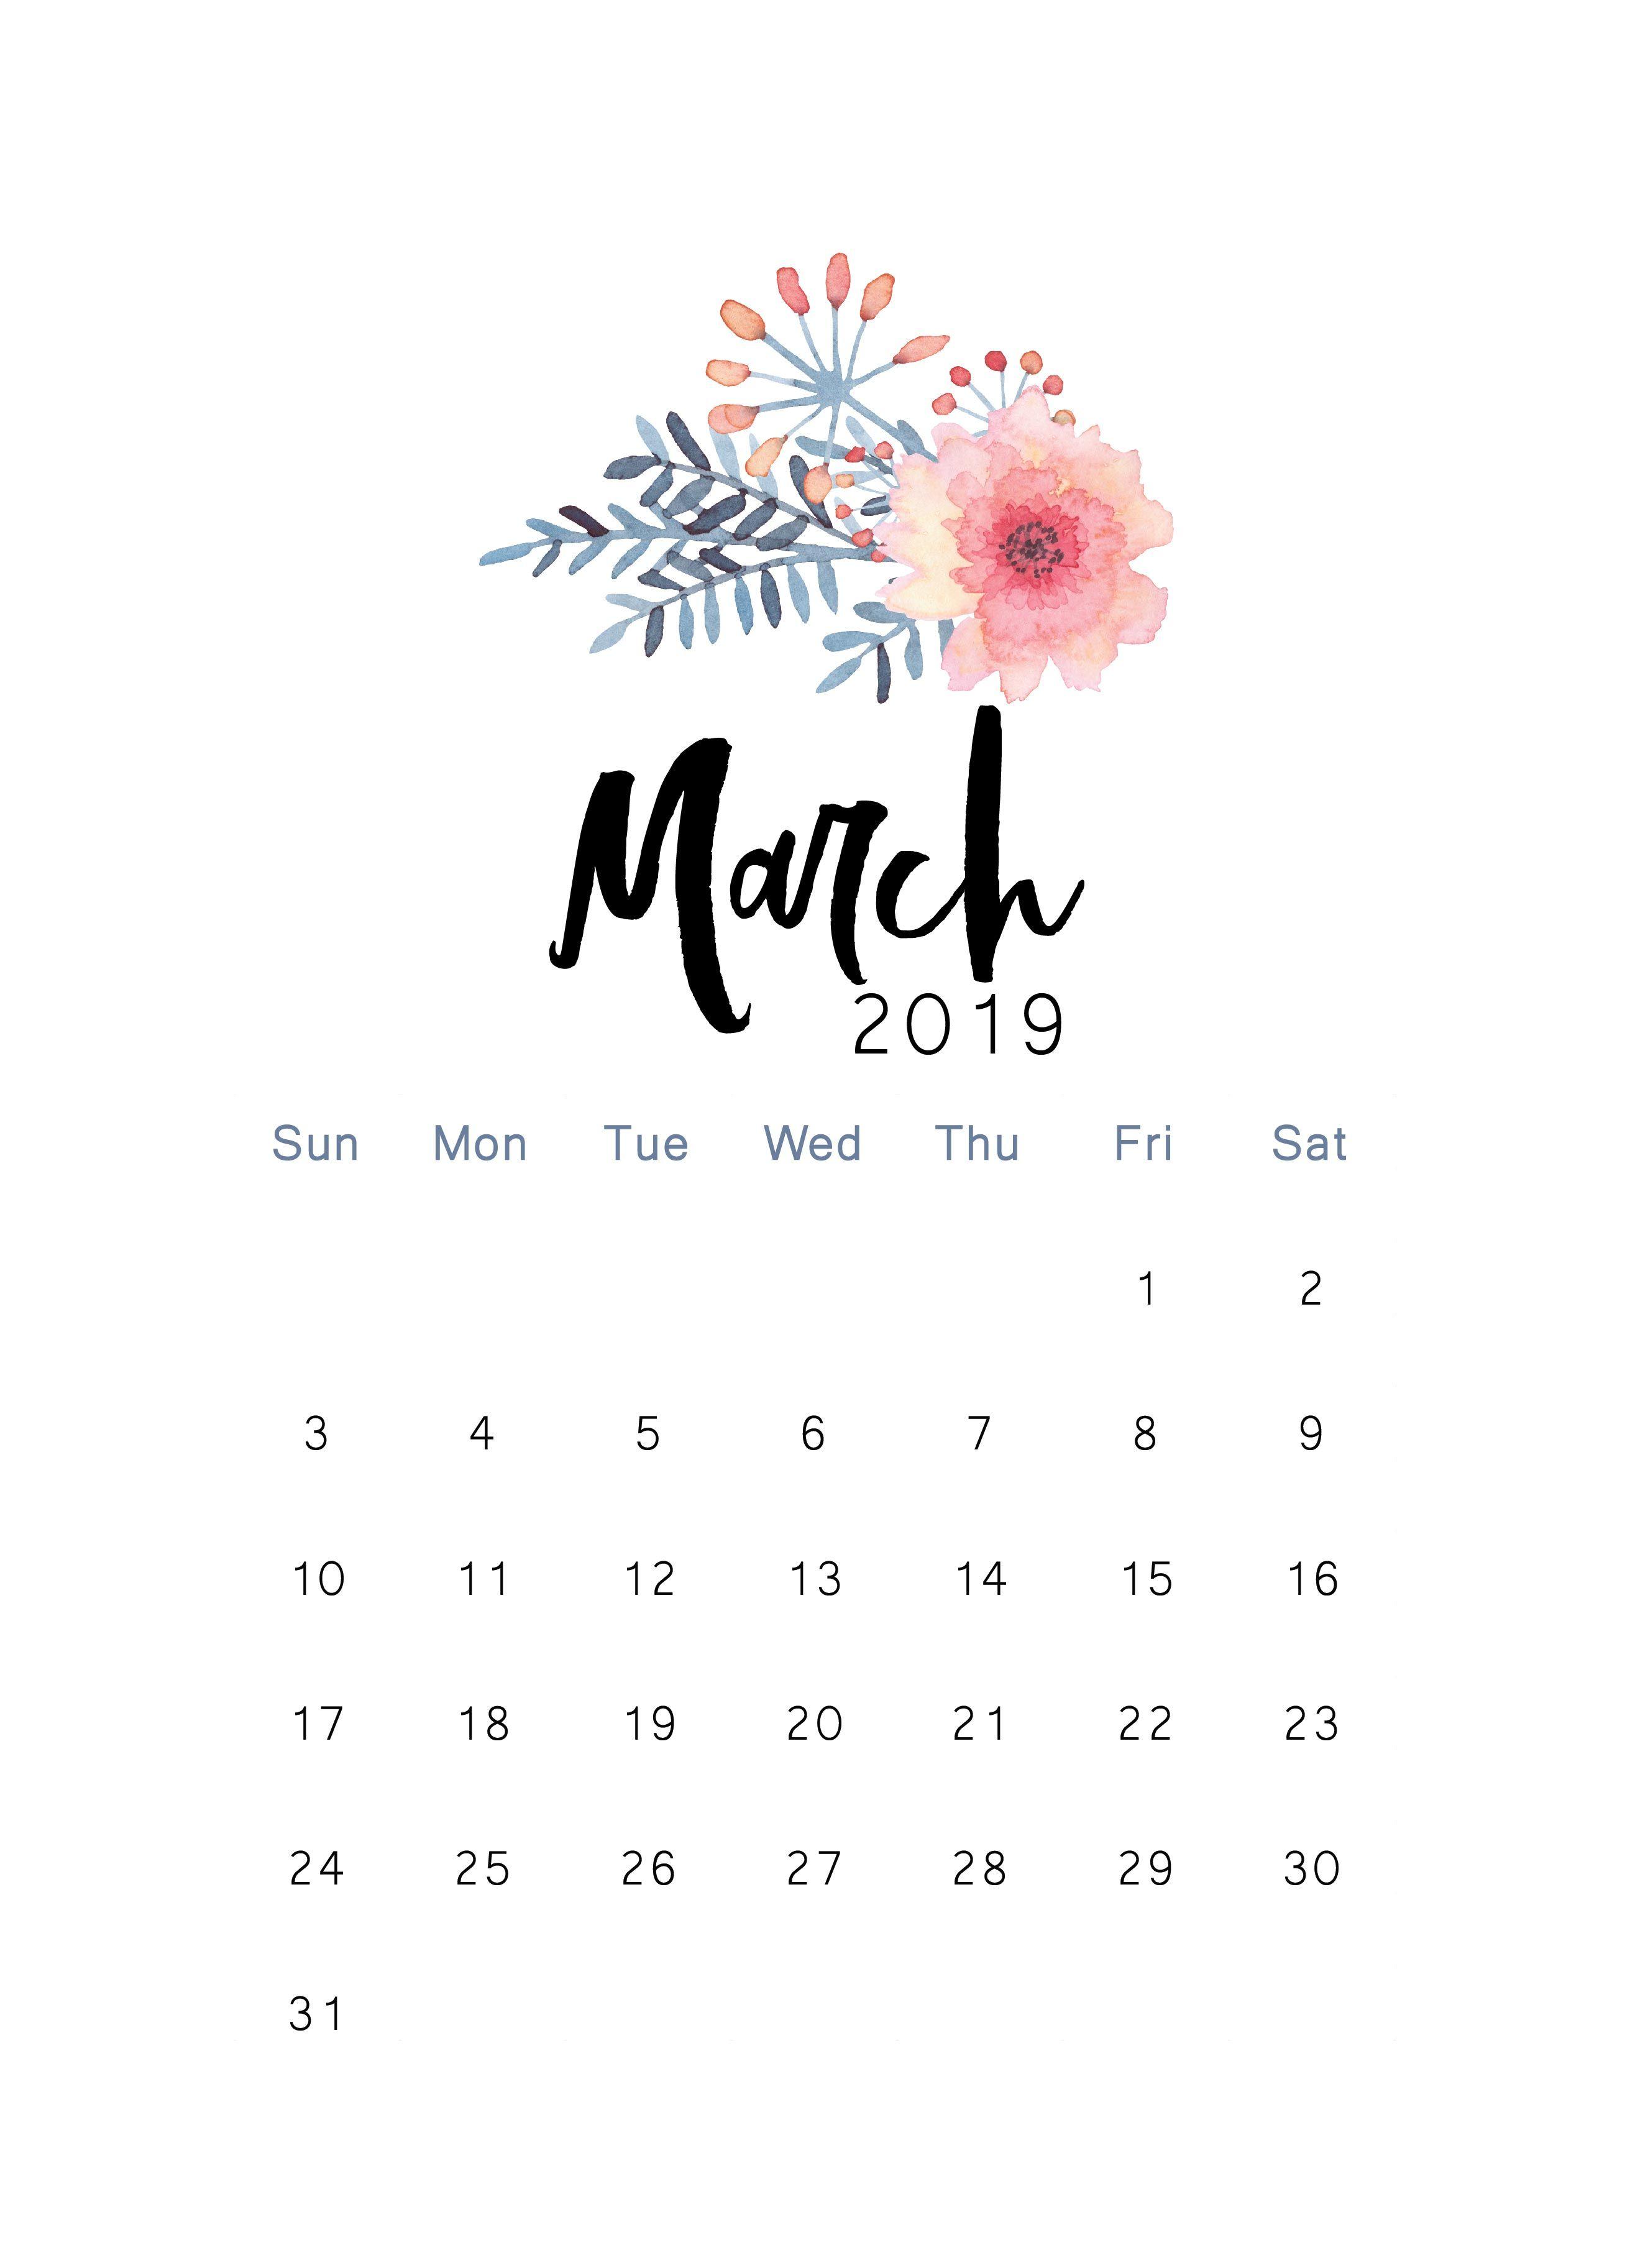 Calendar Planner Stickers : March printable calendar the cactus creative